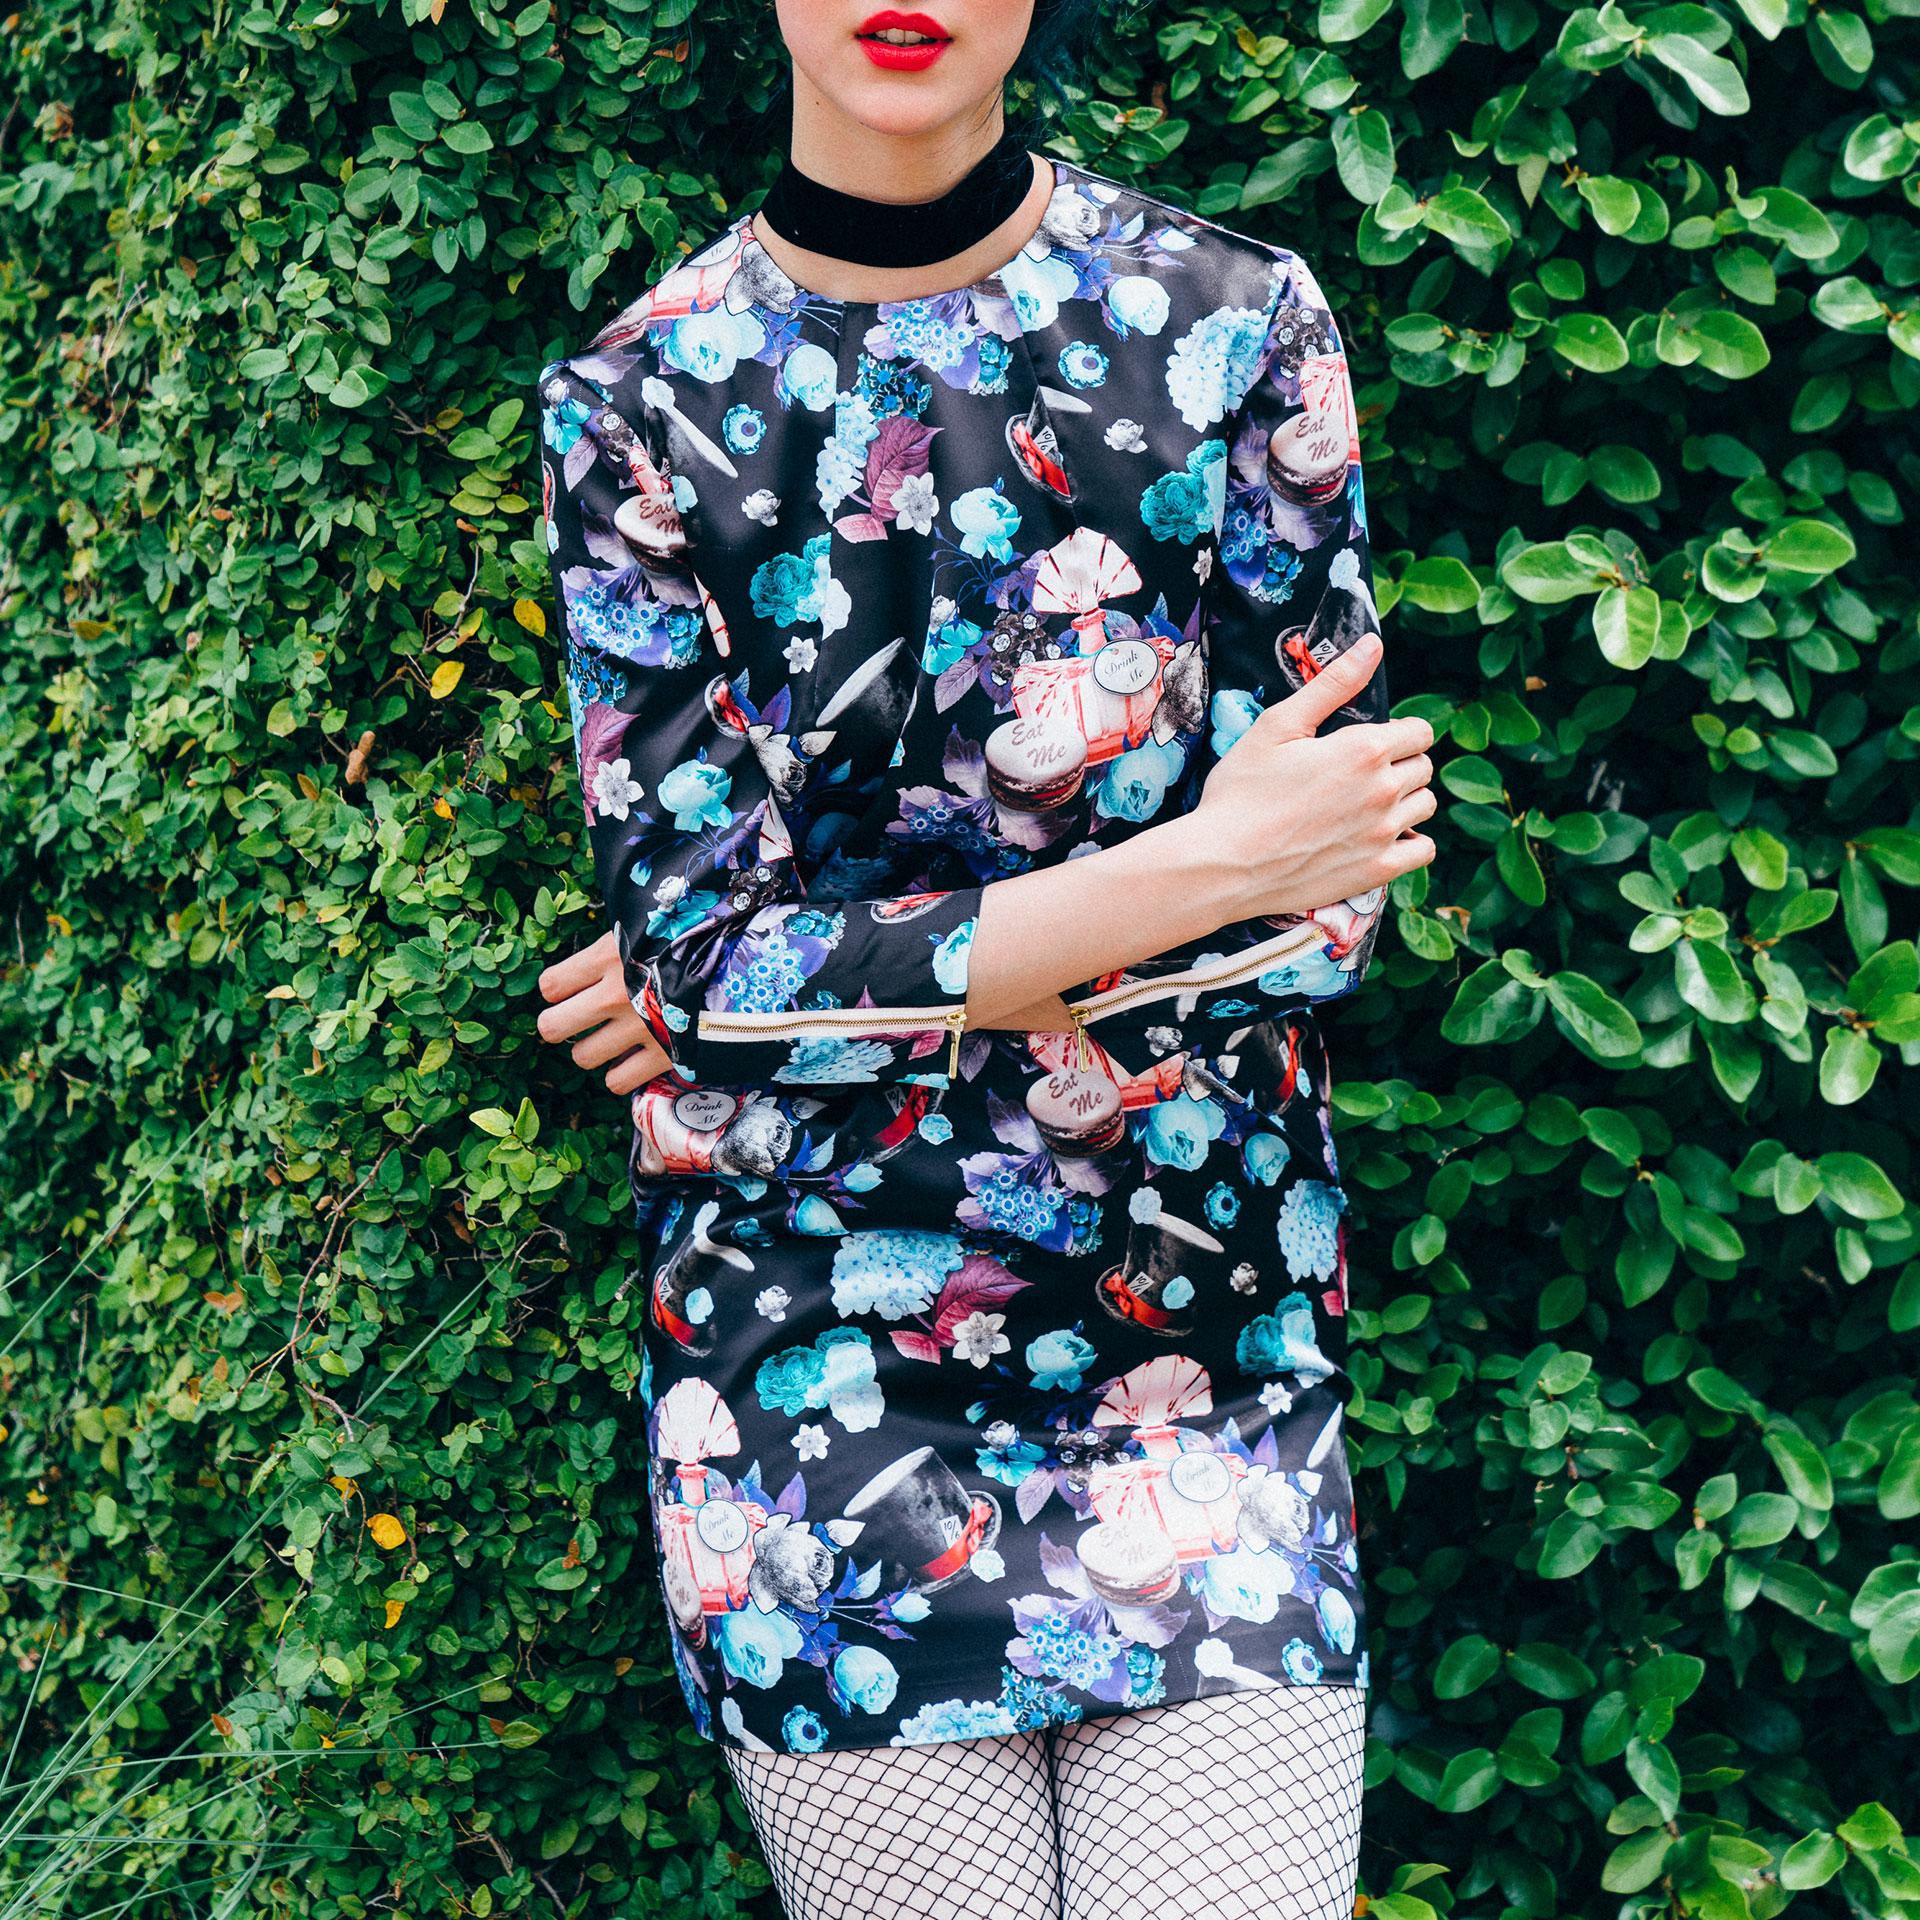 Sweet Me Zipper Dress by Harry Rex - Photo: Todd White